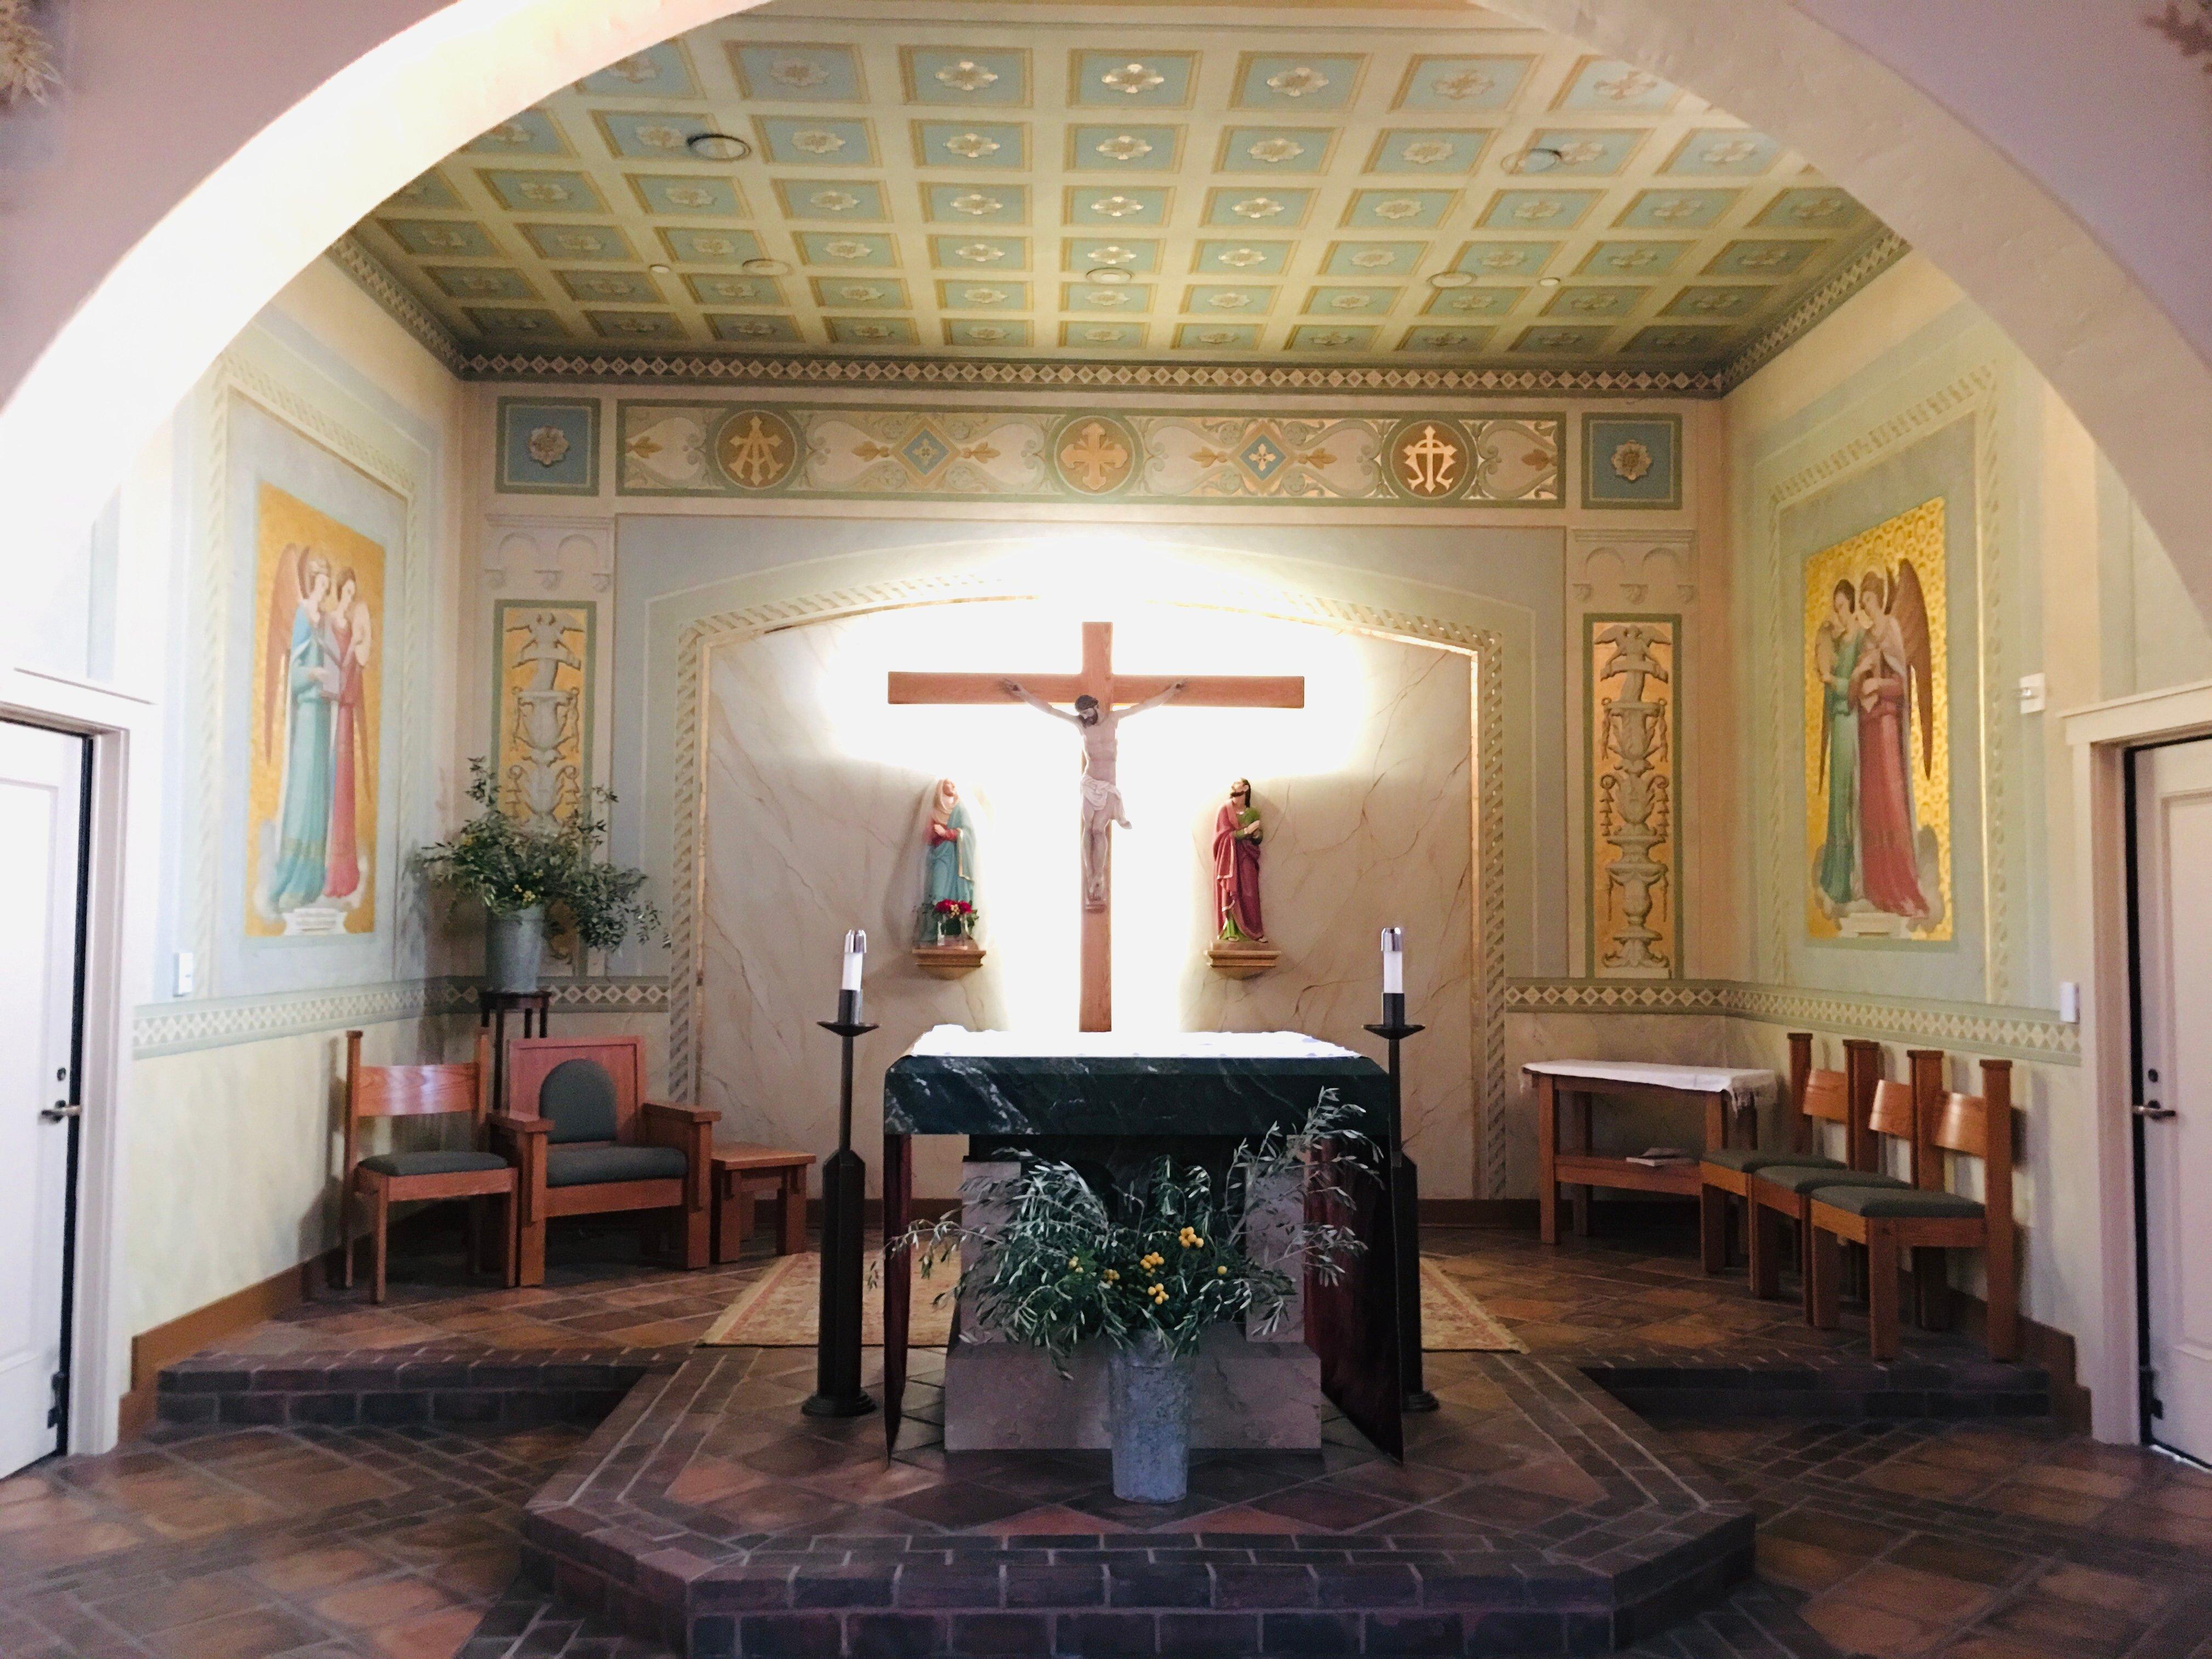 20210118 MHayes 1 St. Catherine of Siena Parish 2016